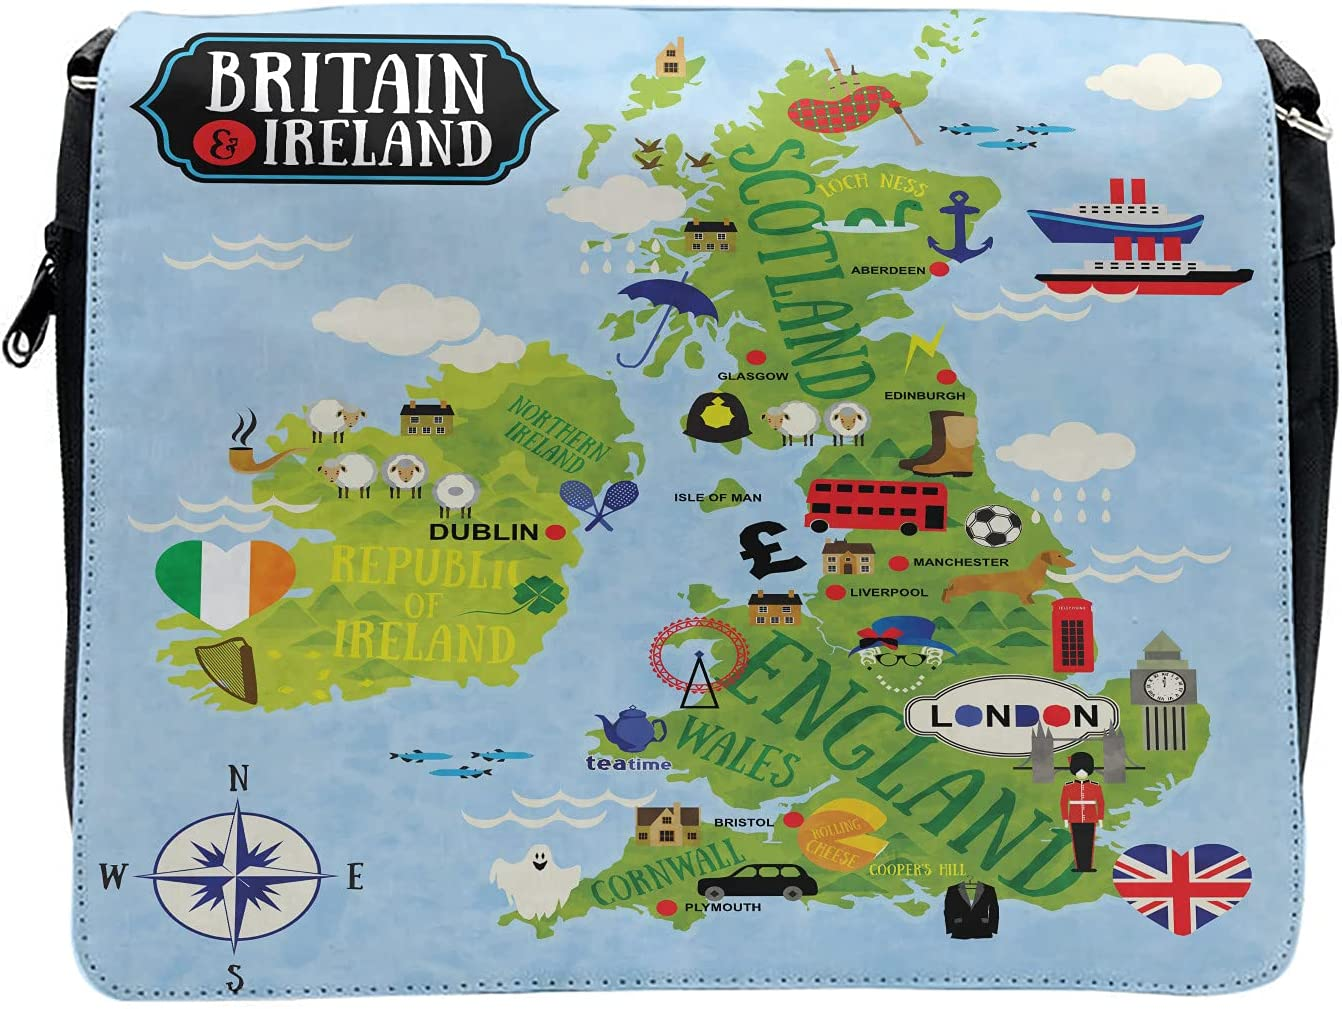 Ambesonne Cartoon Cross Body Messenger Bag, Maps of Britain Ireland, Unisex